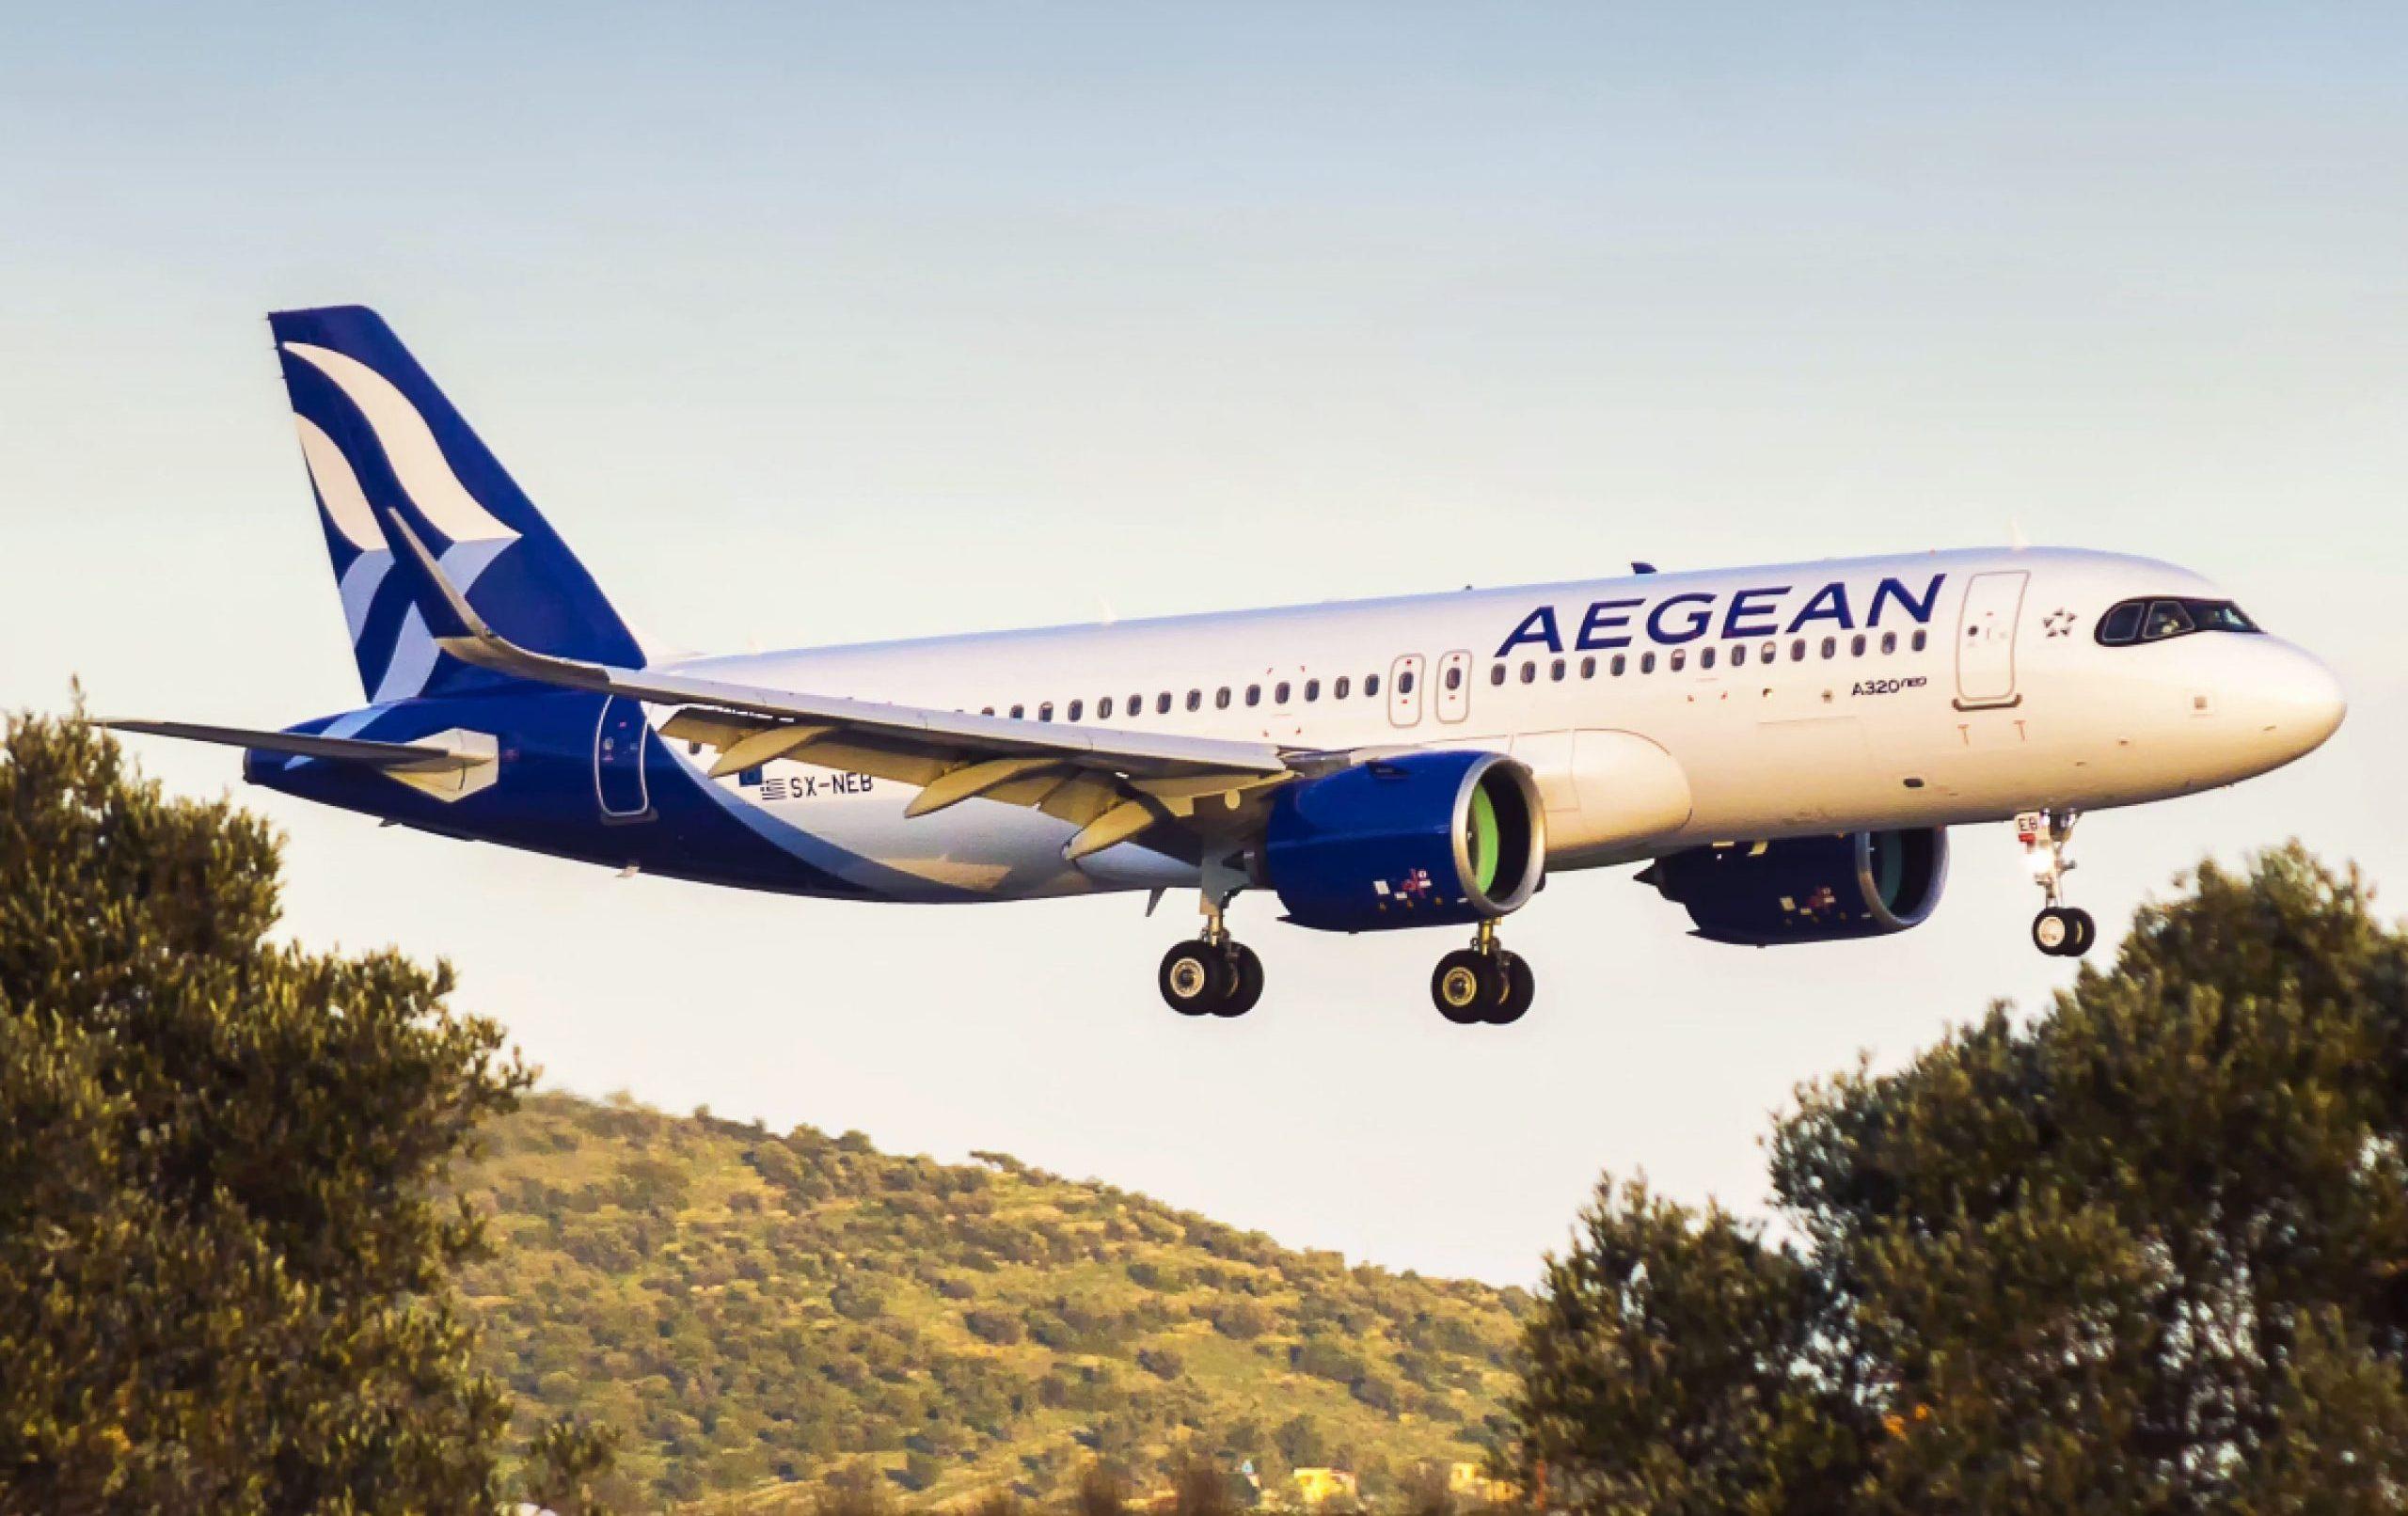 Aegean: Όλοι οι προορισμοί εσωτερικού από 19 ευρώ